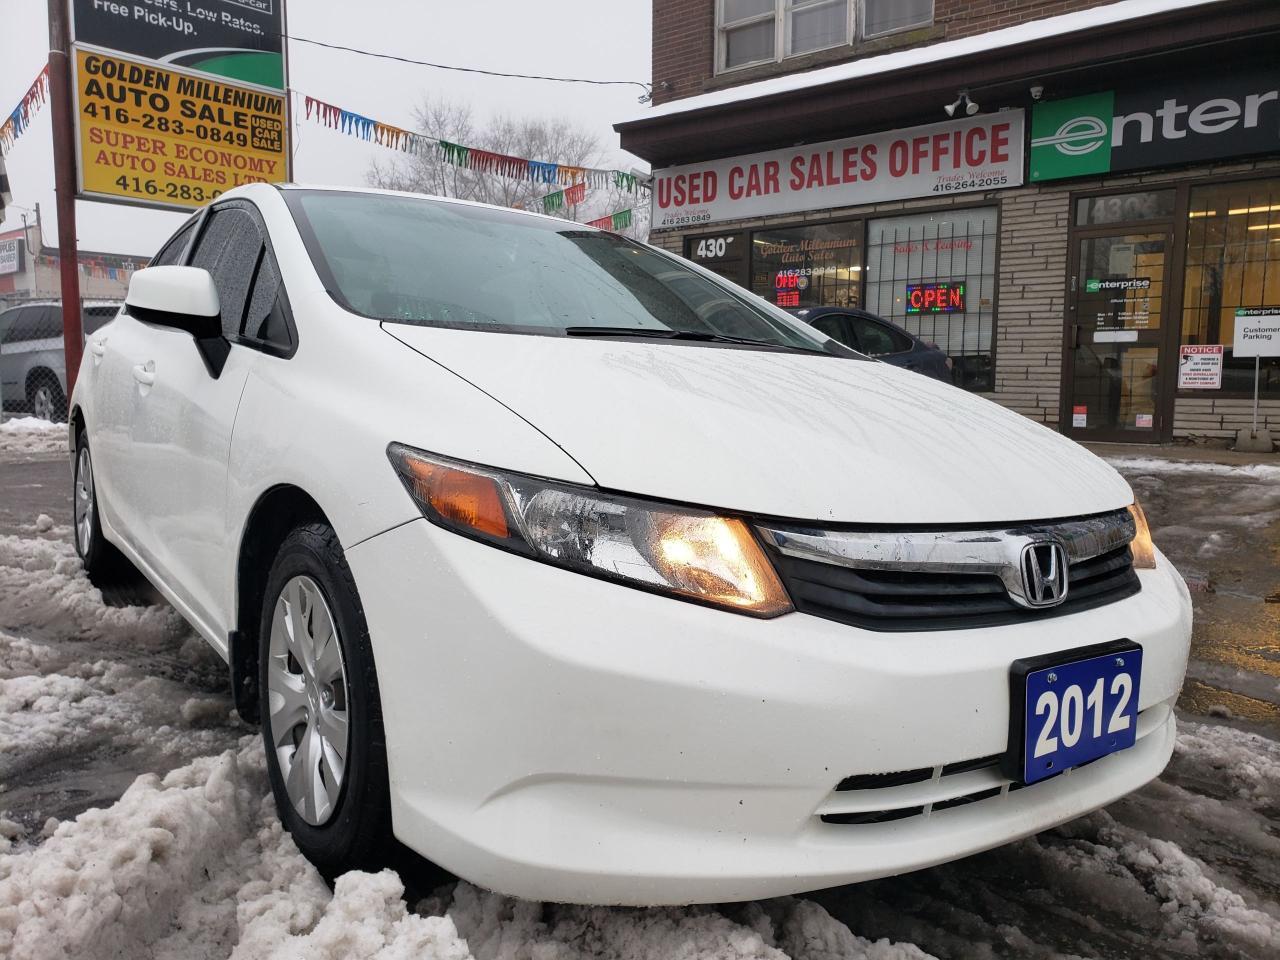 Used 2012 Honda Civic Lx 160k Mint Condition Econ Gas Saver